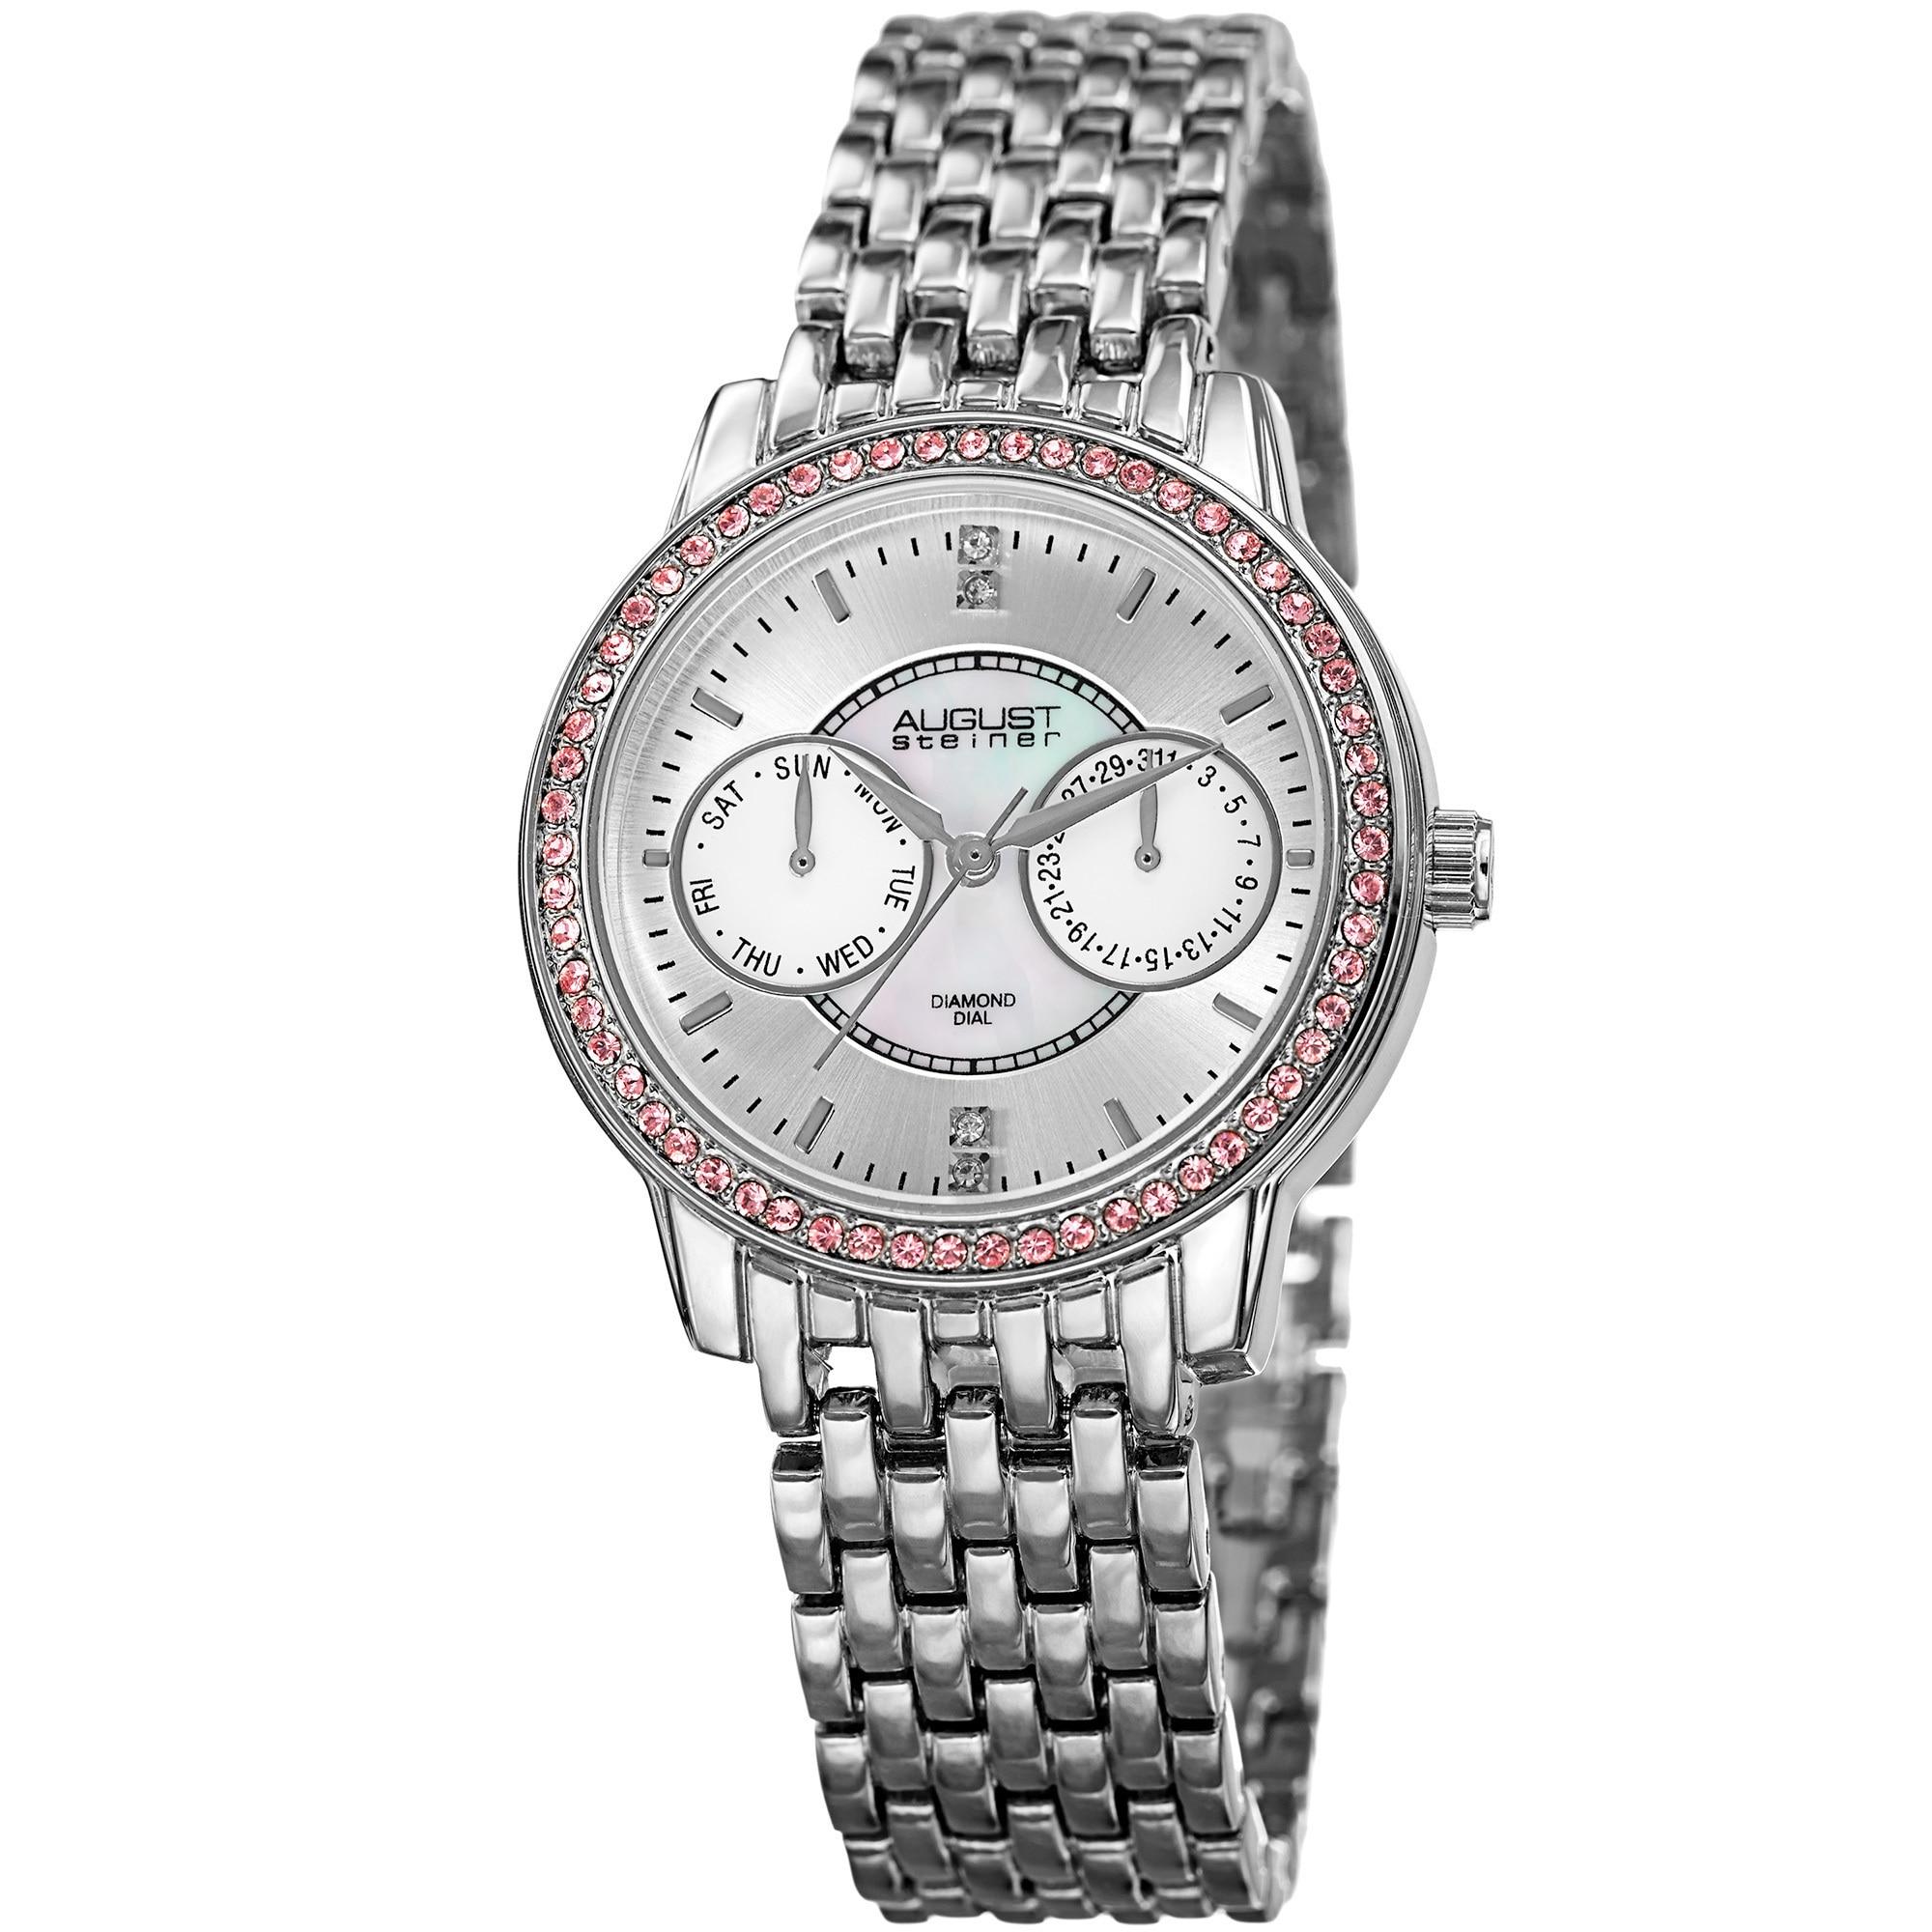 315b8a38c221 August Steiner Women s Quartz Multifunction Diamond Silver-Tone Bracelet  Watch